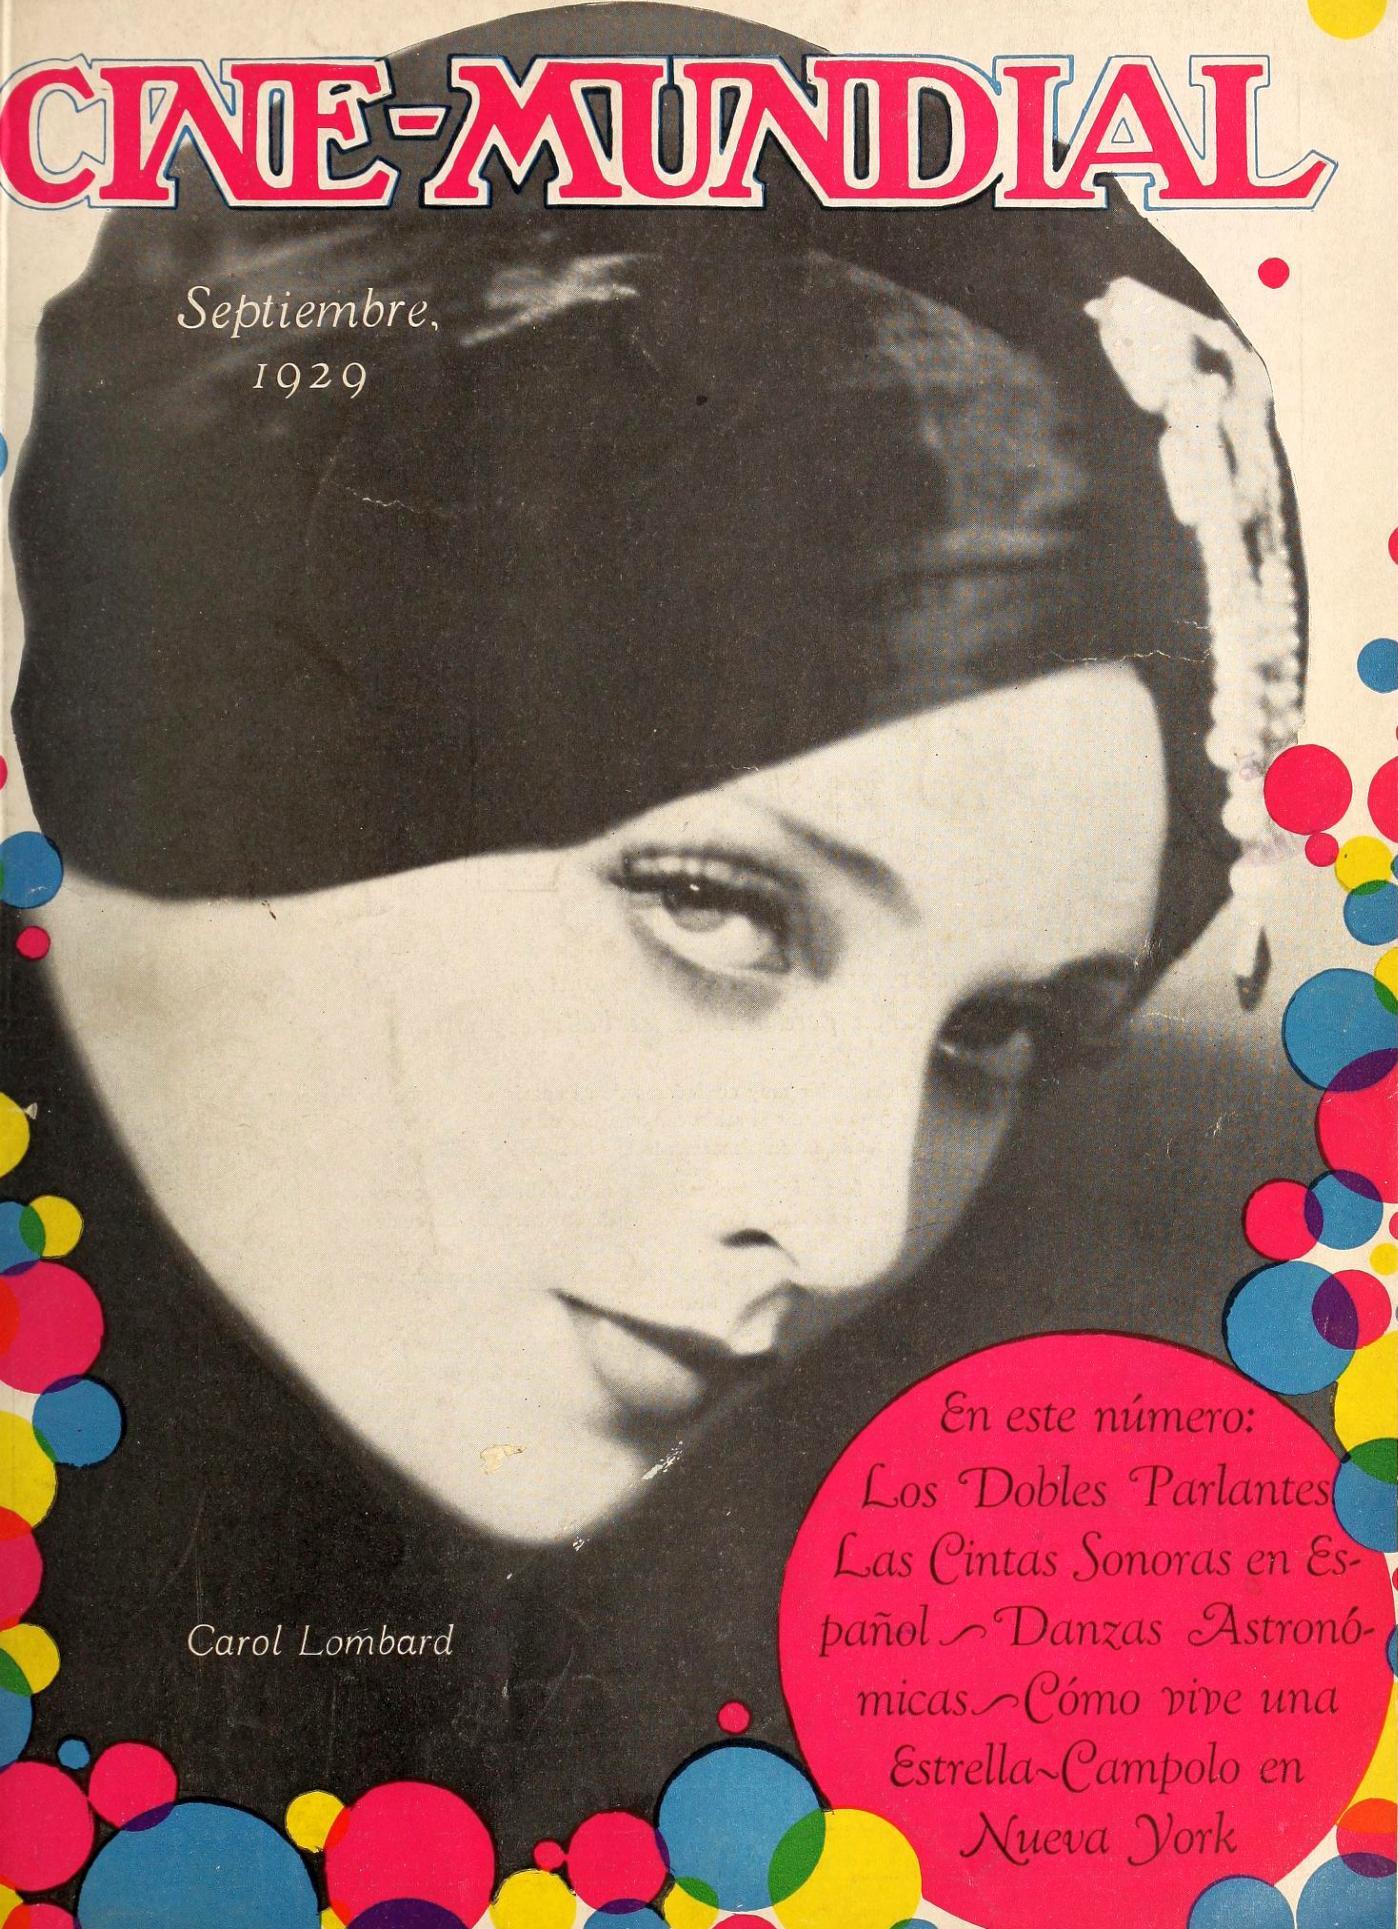 carole lombard cine mundial september 1929b cover